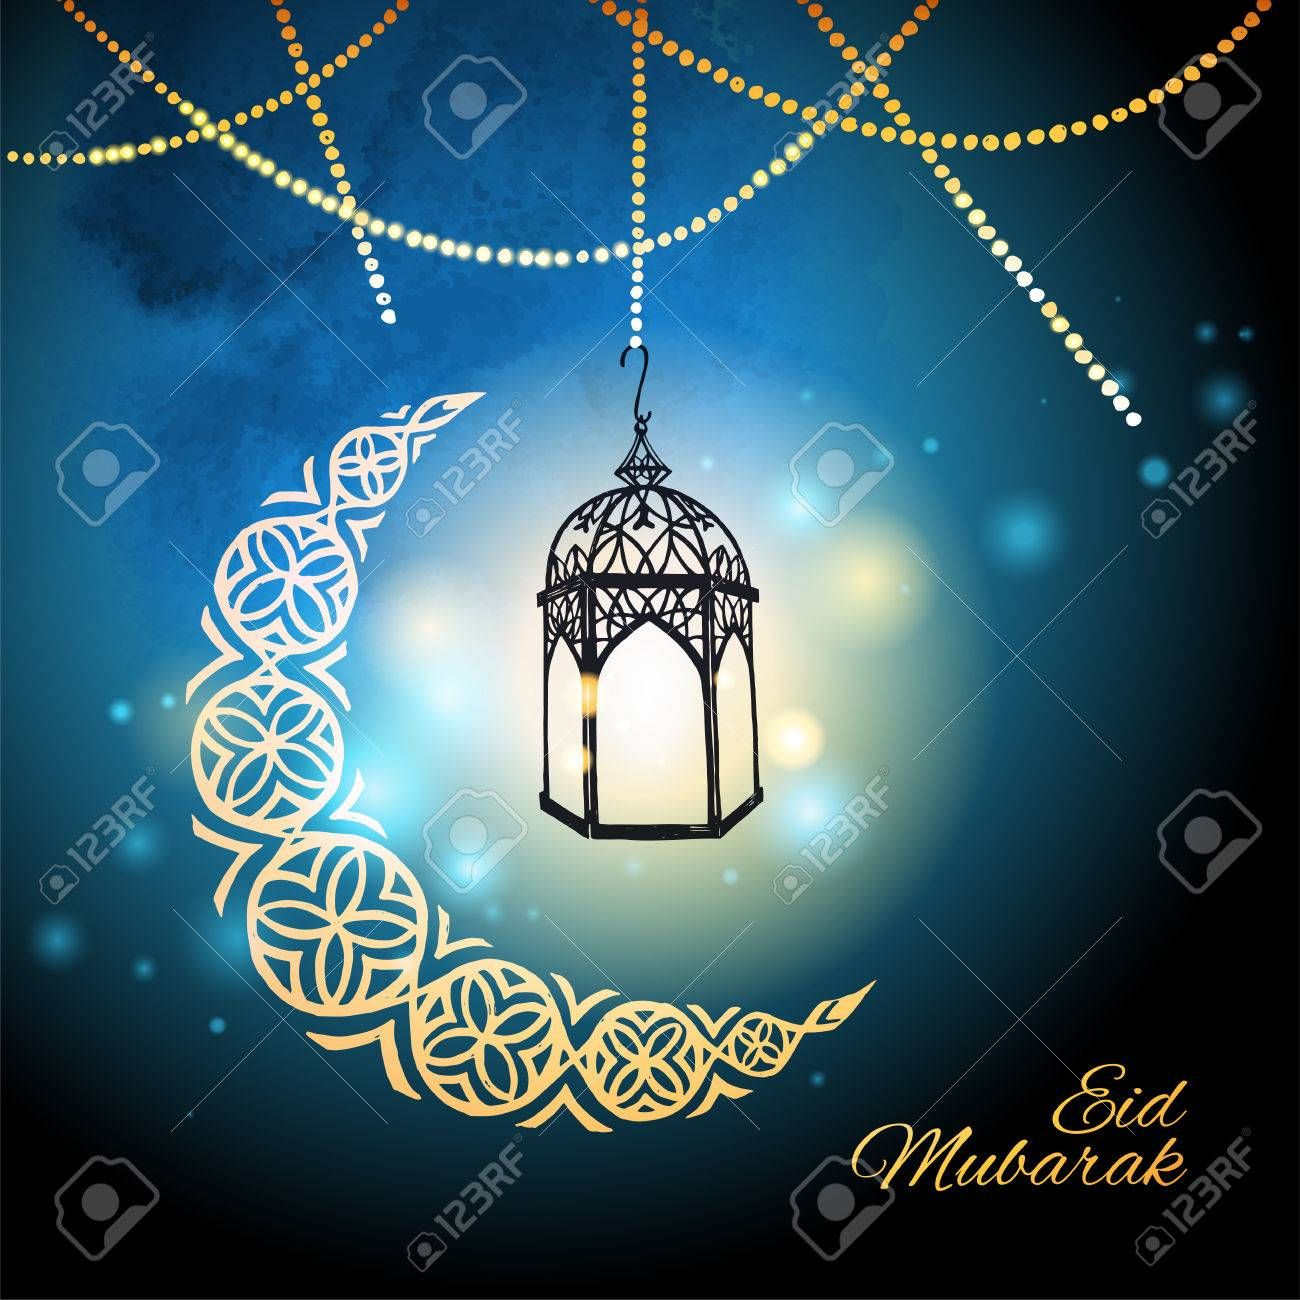 Eid Mubarak Greeting Card Template Affiliate Mubarak Eid Greeting Template Card Eid Card Template Eid Card Designs Eid Mubarak Card